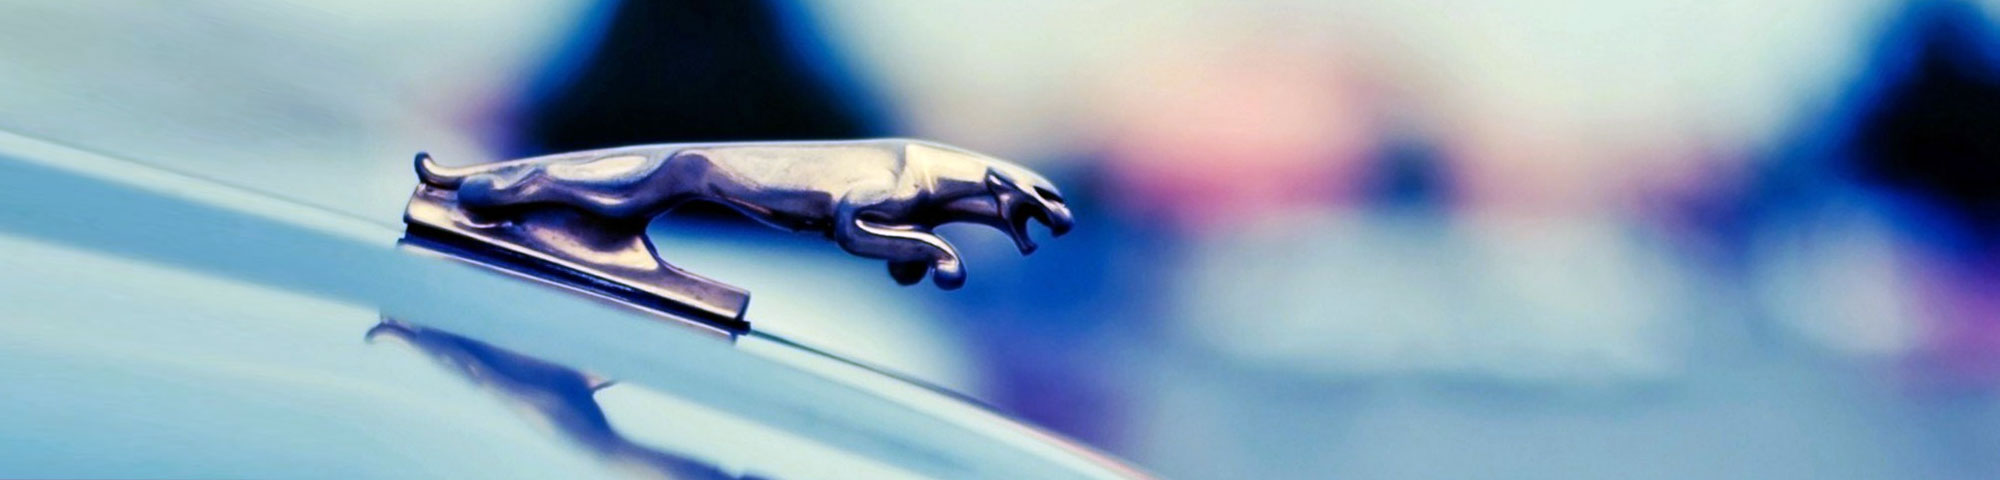 CLMS - Manufacturer - Jaguar